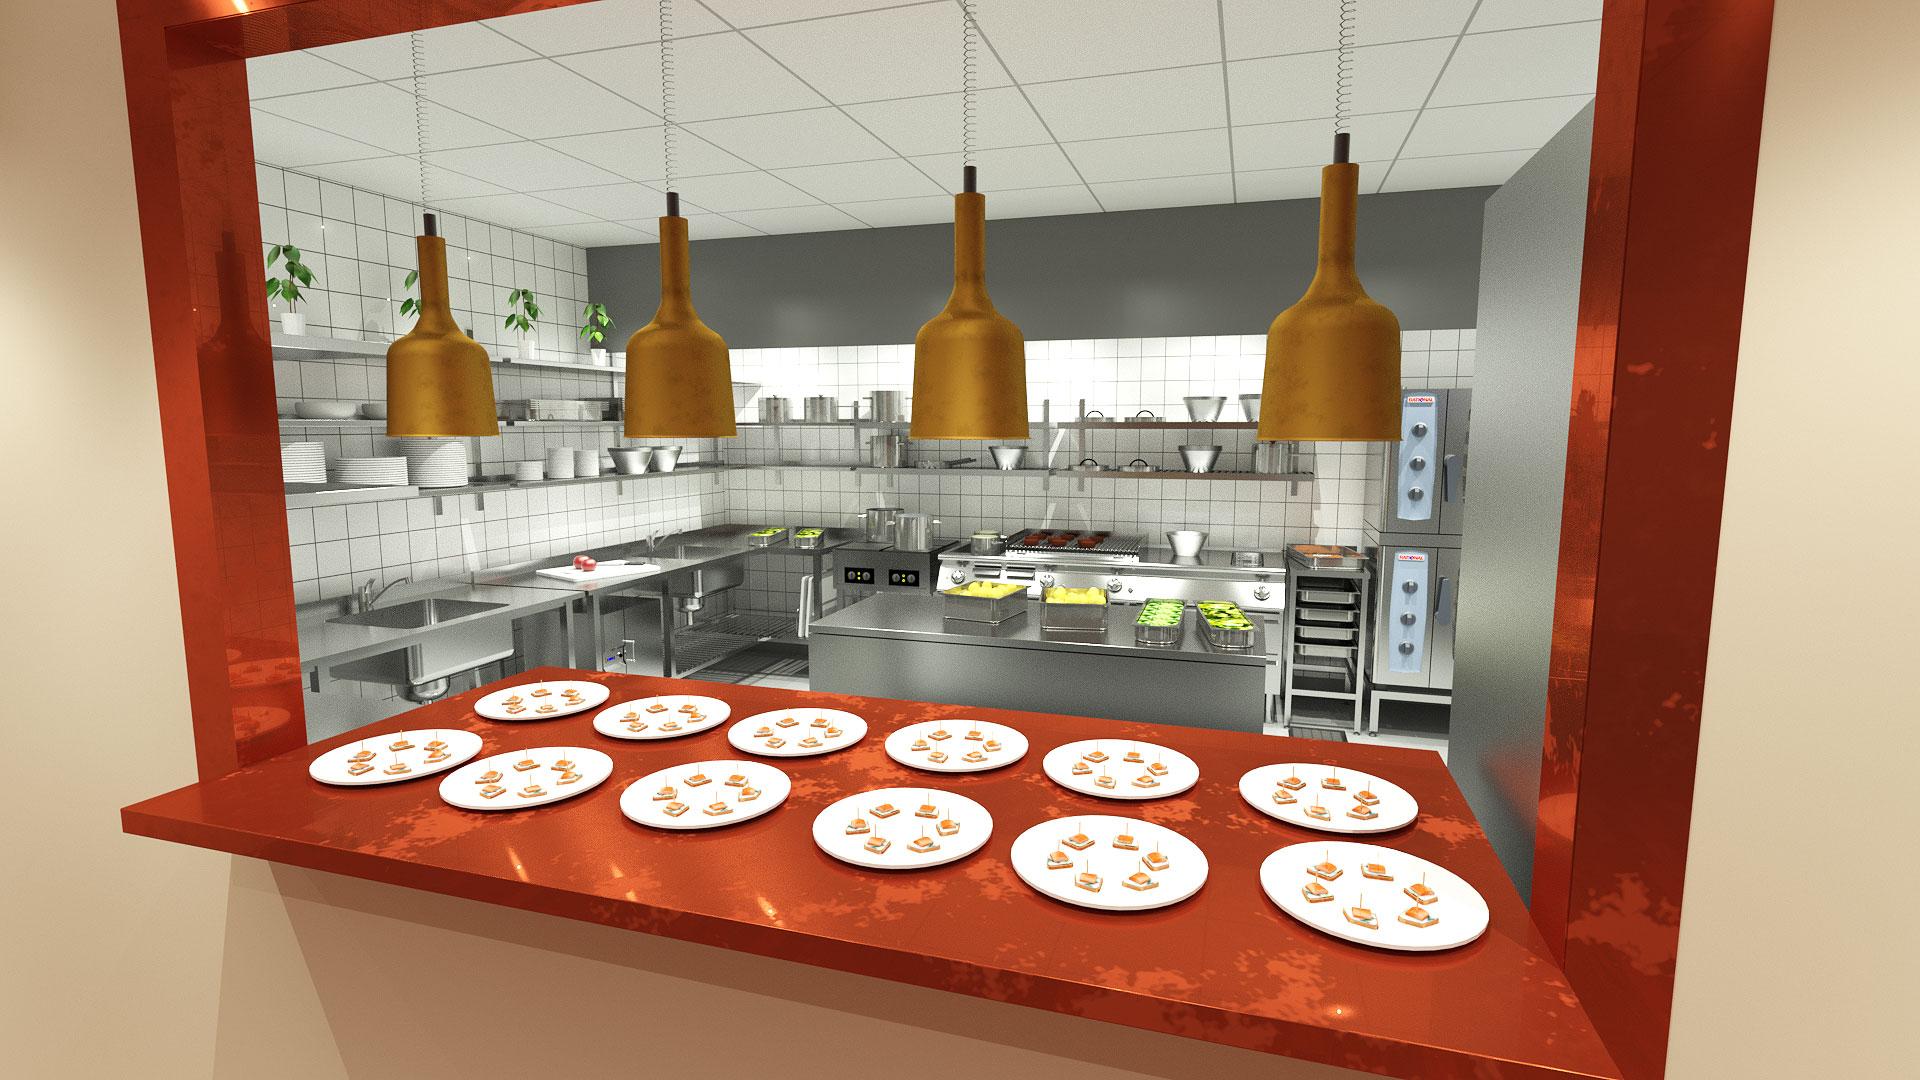 Köksprojekt 3d studio Kosta Brasserie